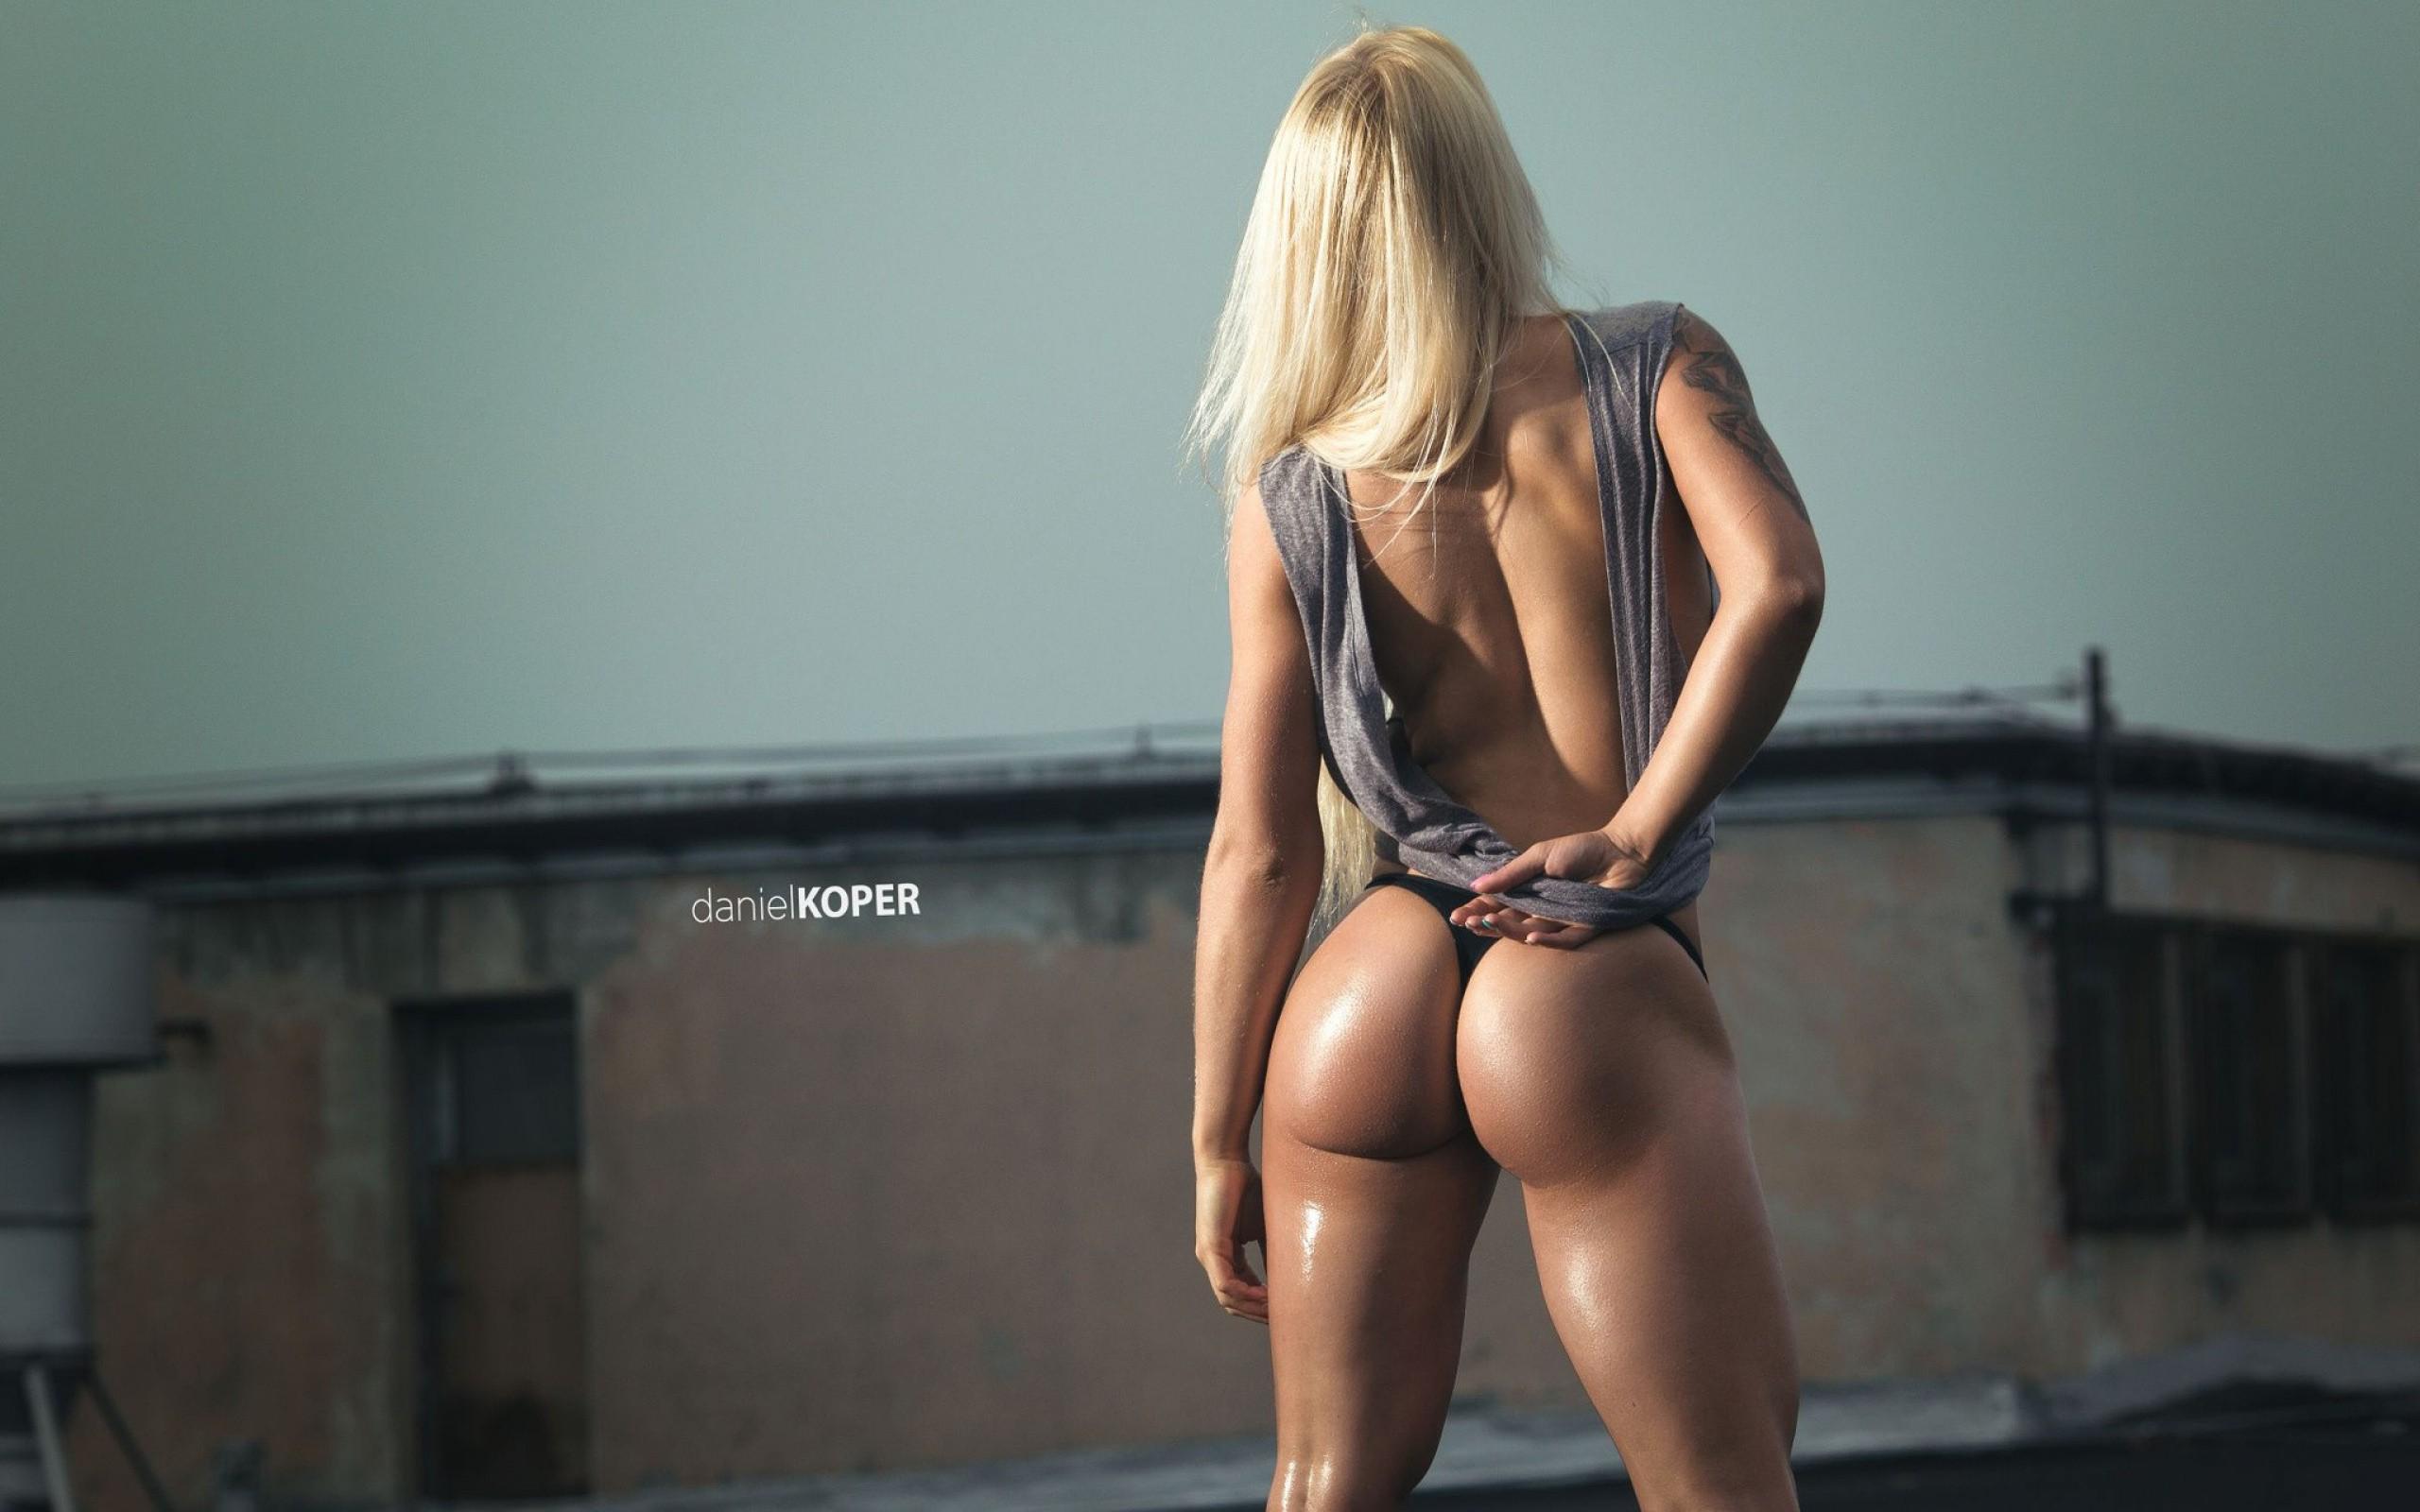 golie-blondinki-zhopi-v-stringah-domashnee-porno-seks-video-na-russkom